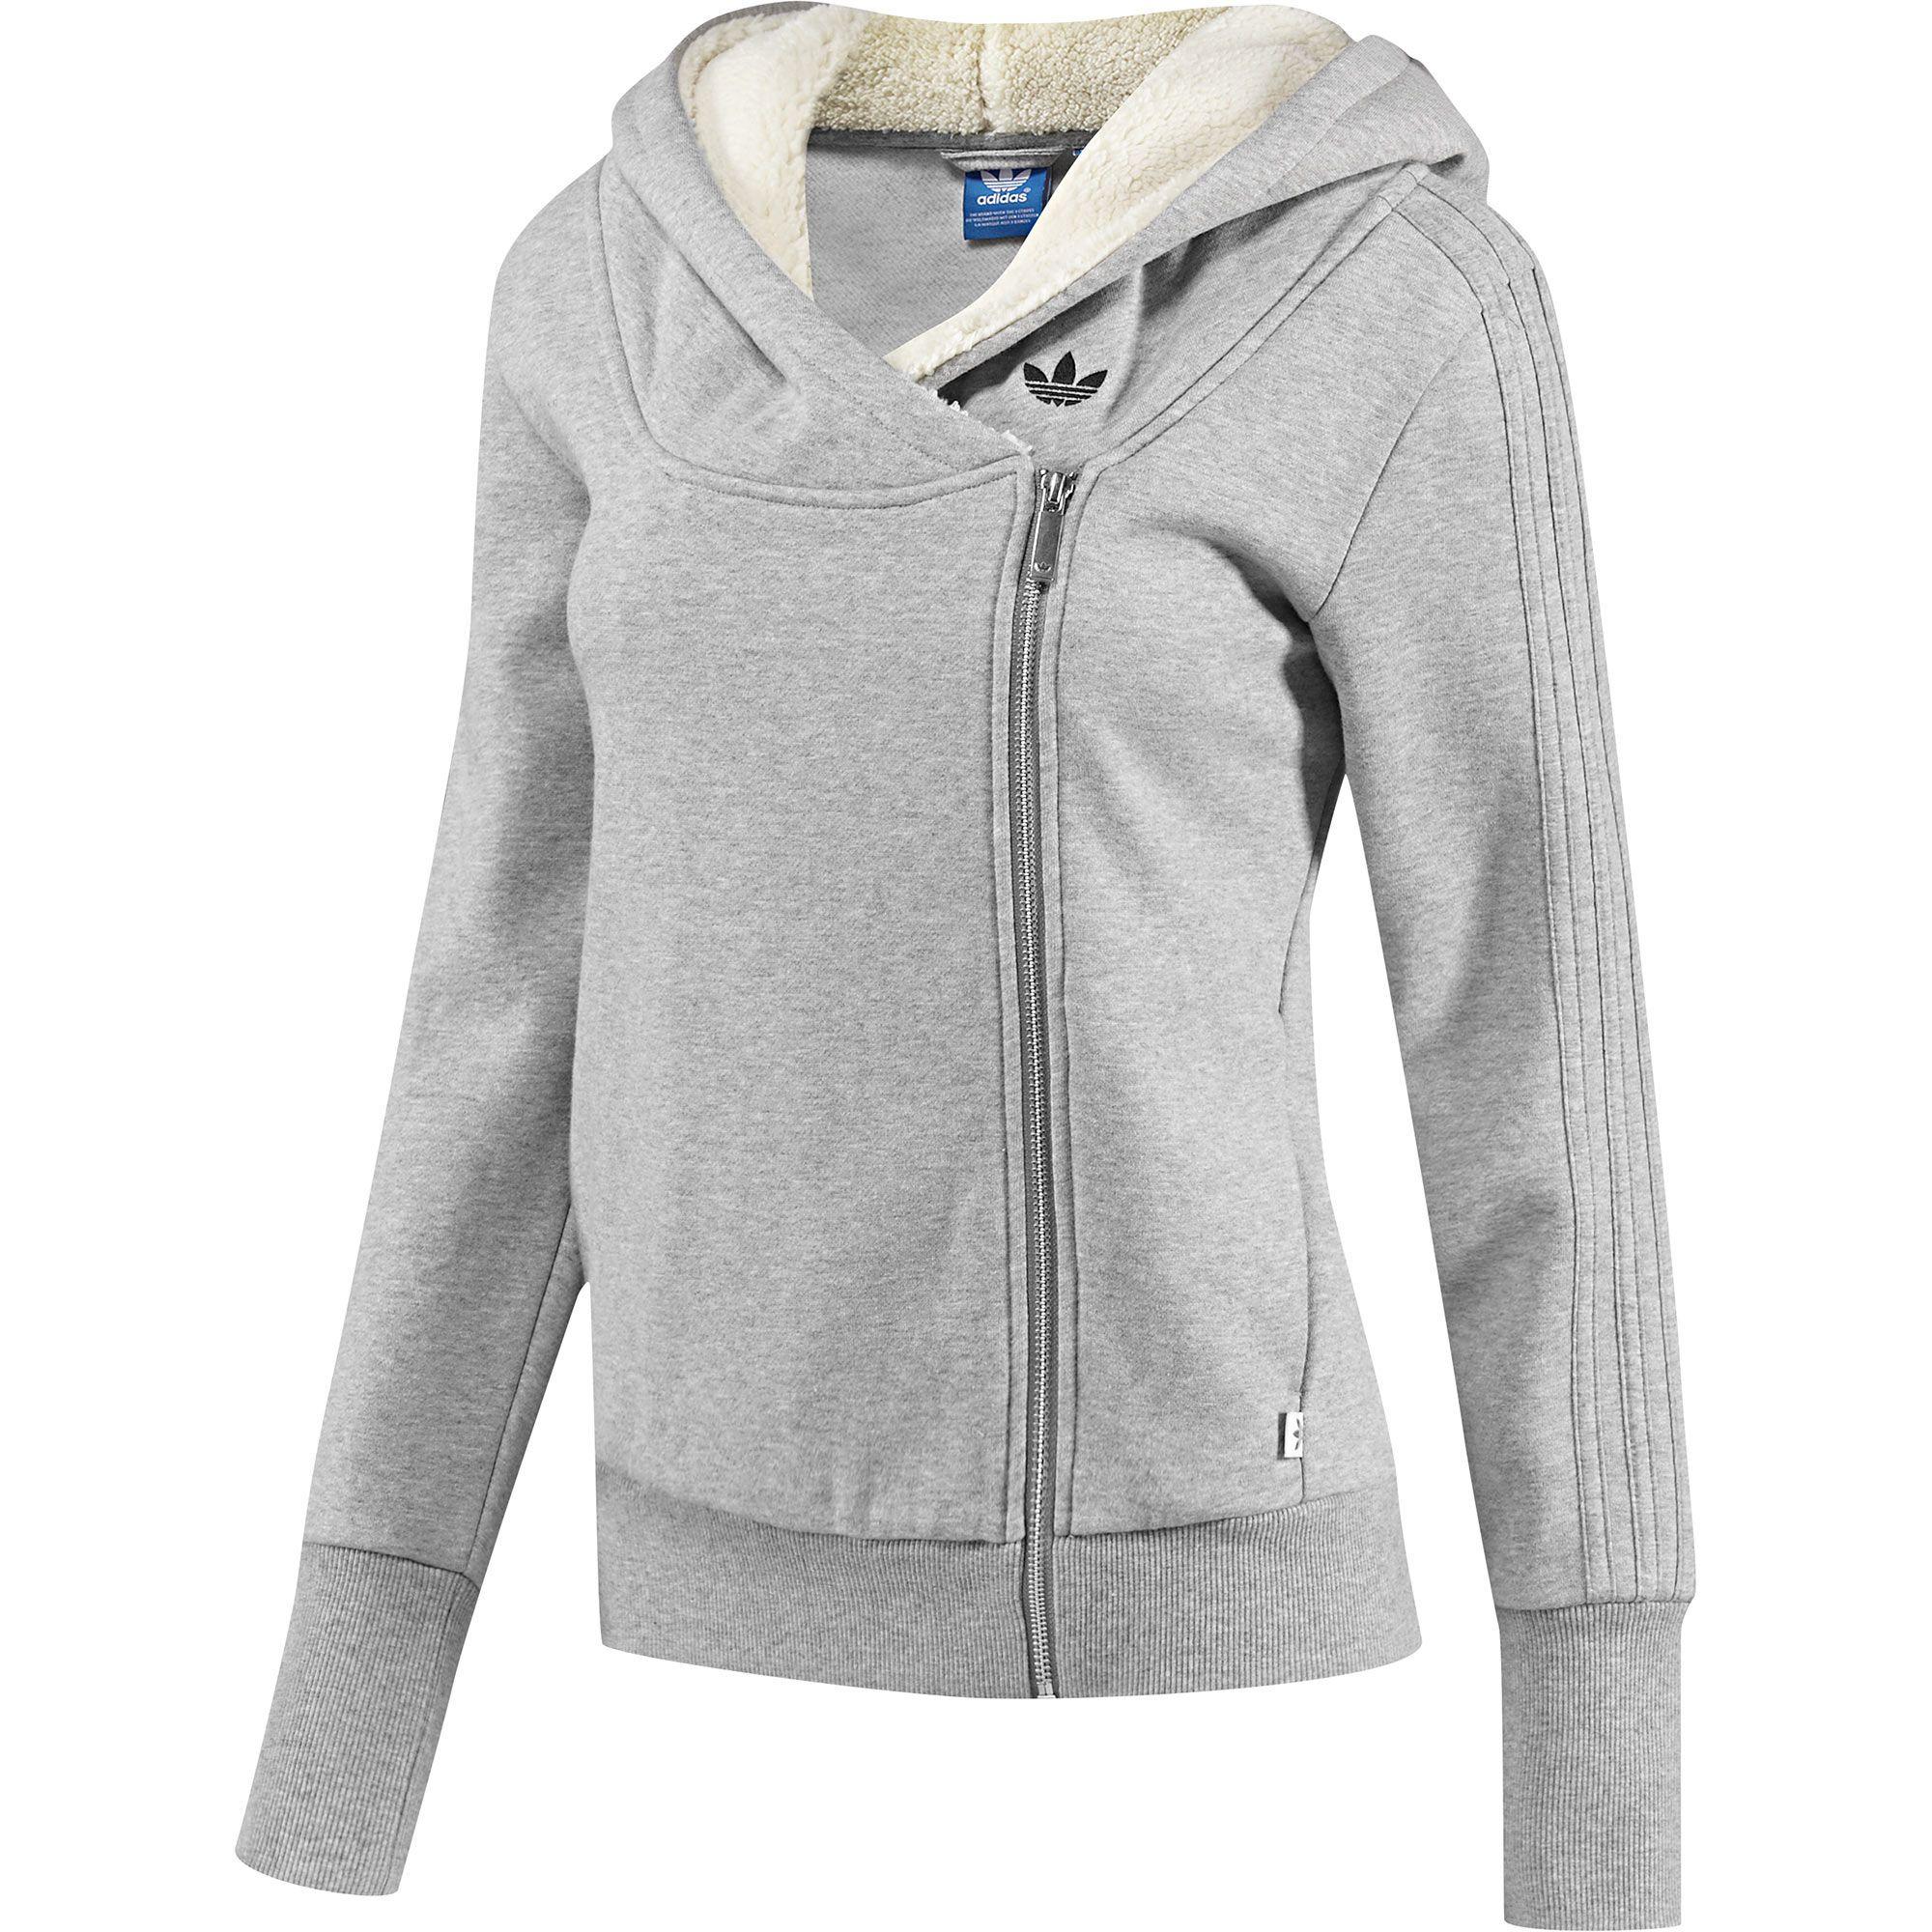 b80cda6f adidas fleece track top | adidas | Jackets, Adidas, Fashion outfits